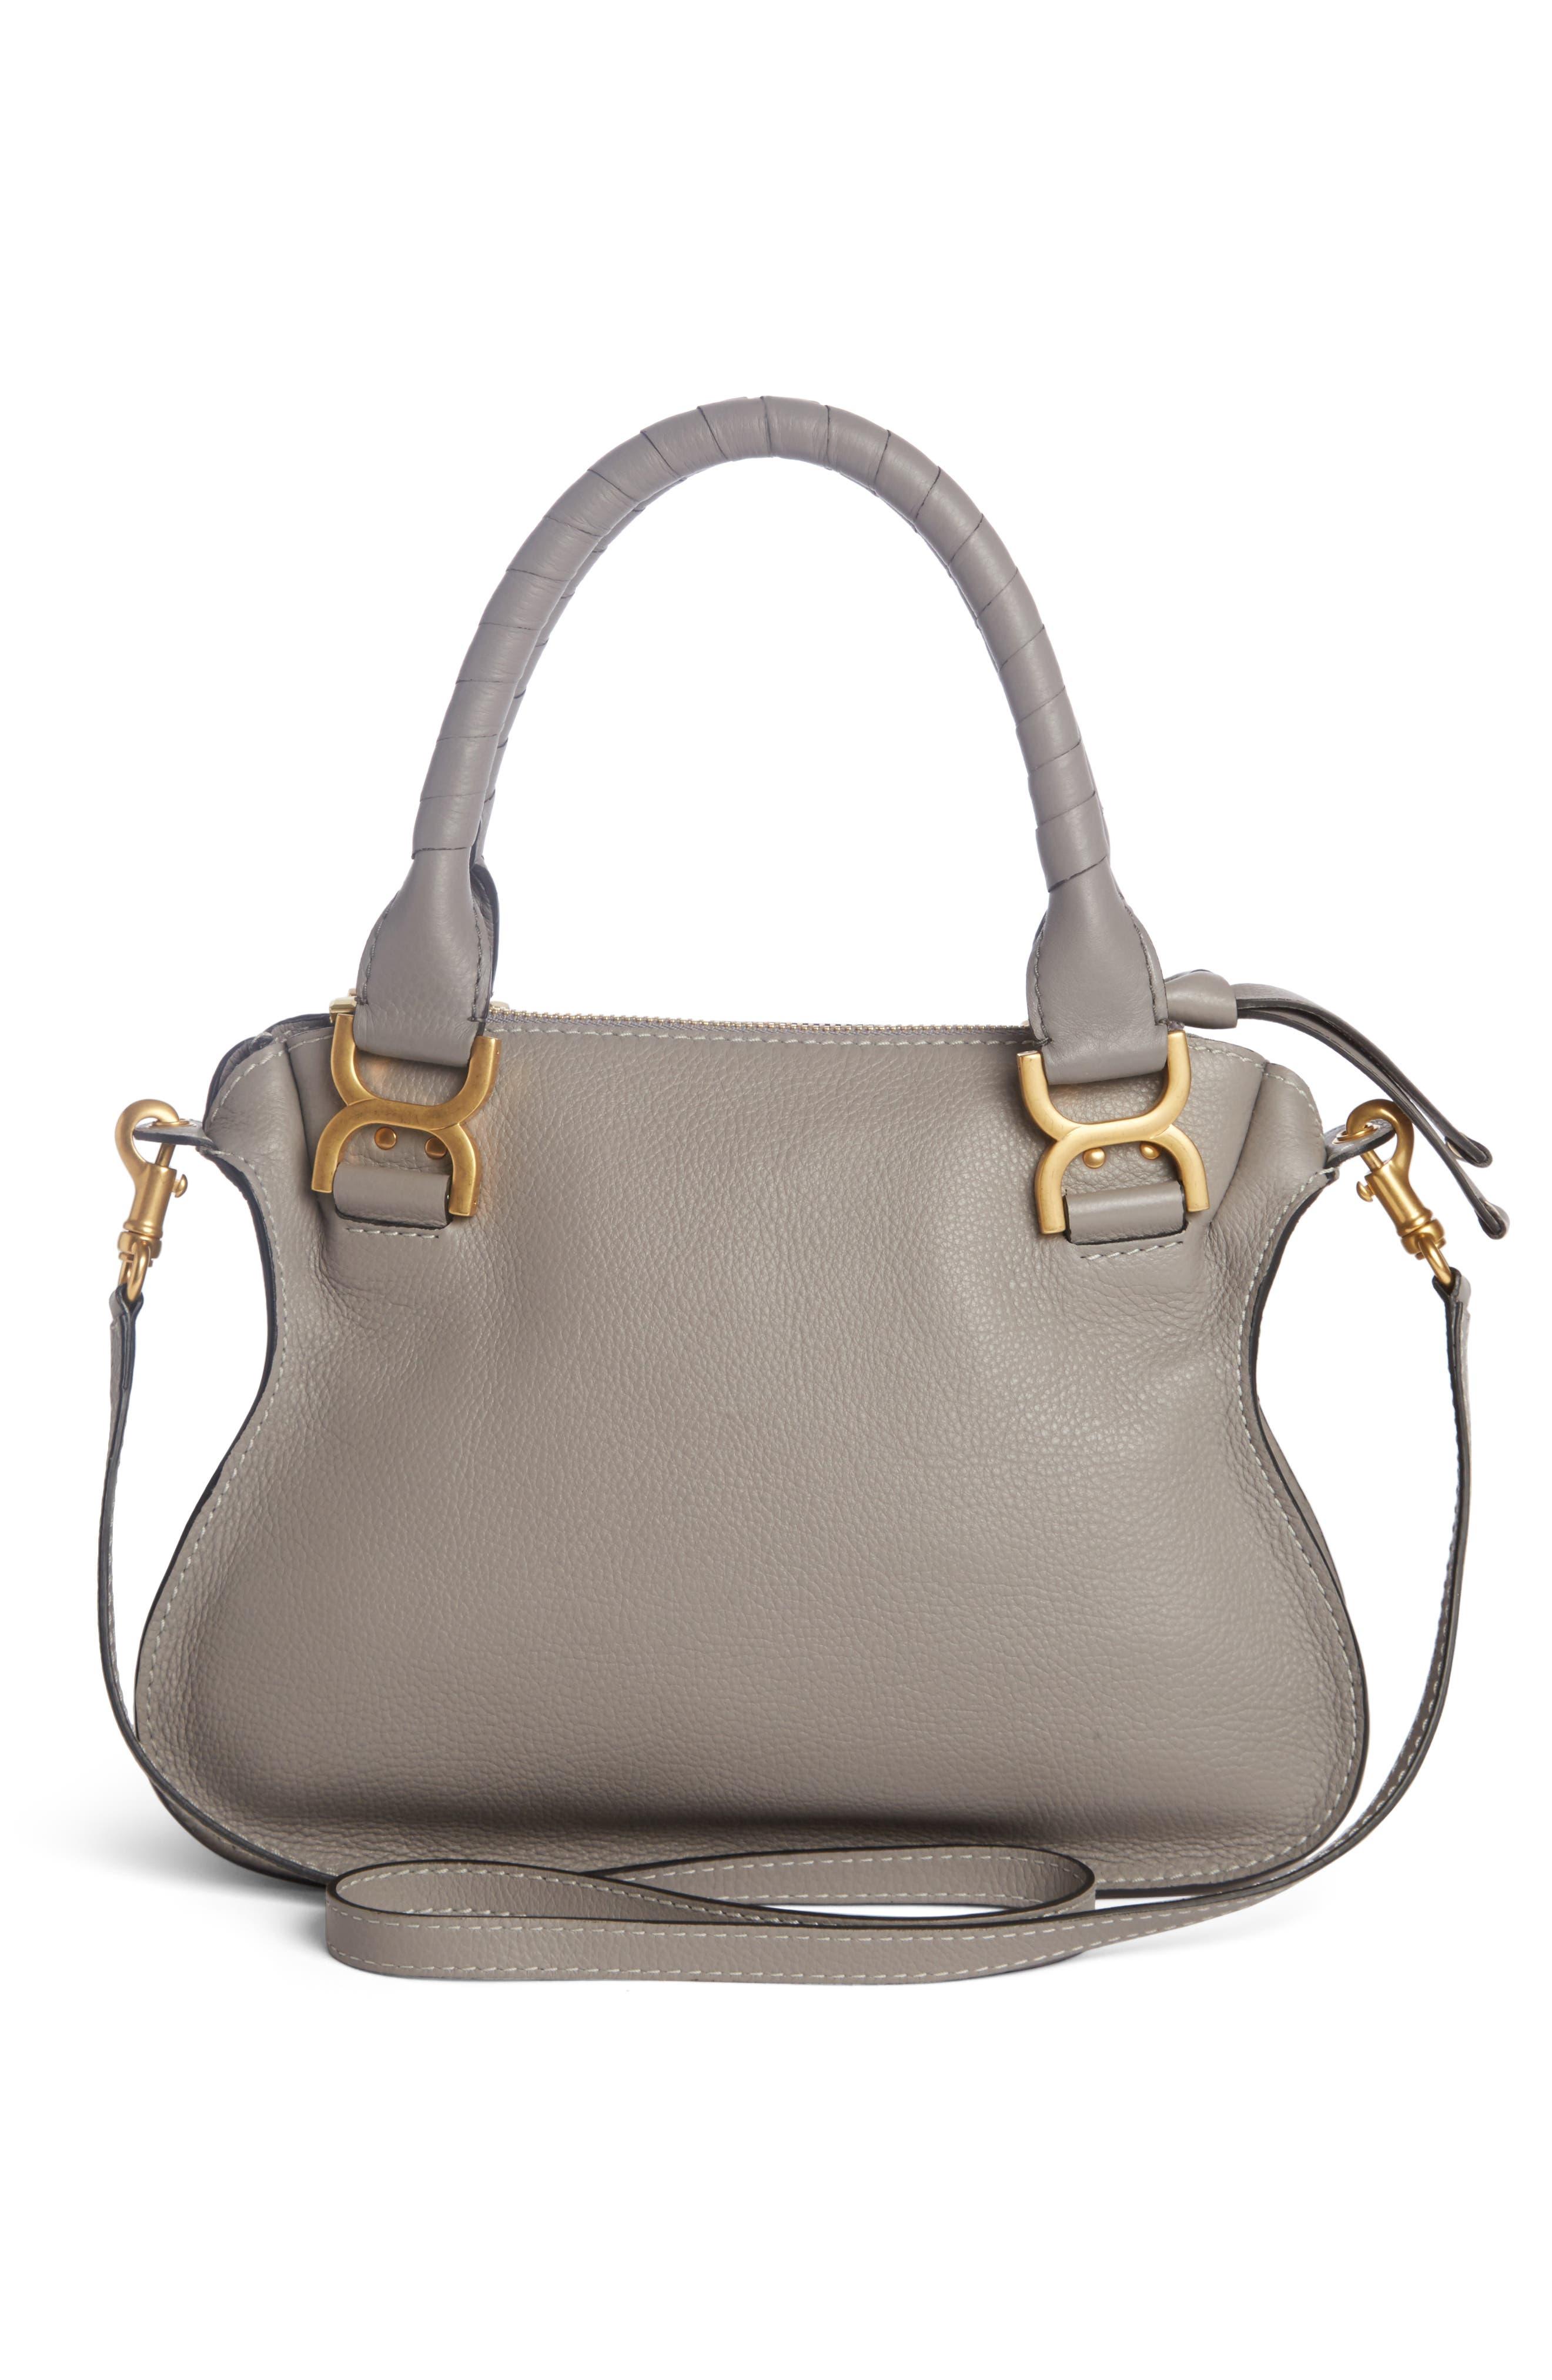 CHLOÉ, Marcie Small Double Carry Bag, Alternate thumbnail 3, color, CASHMERE GREY